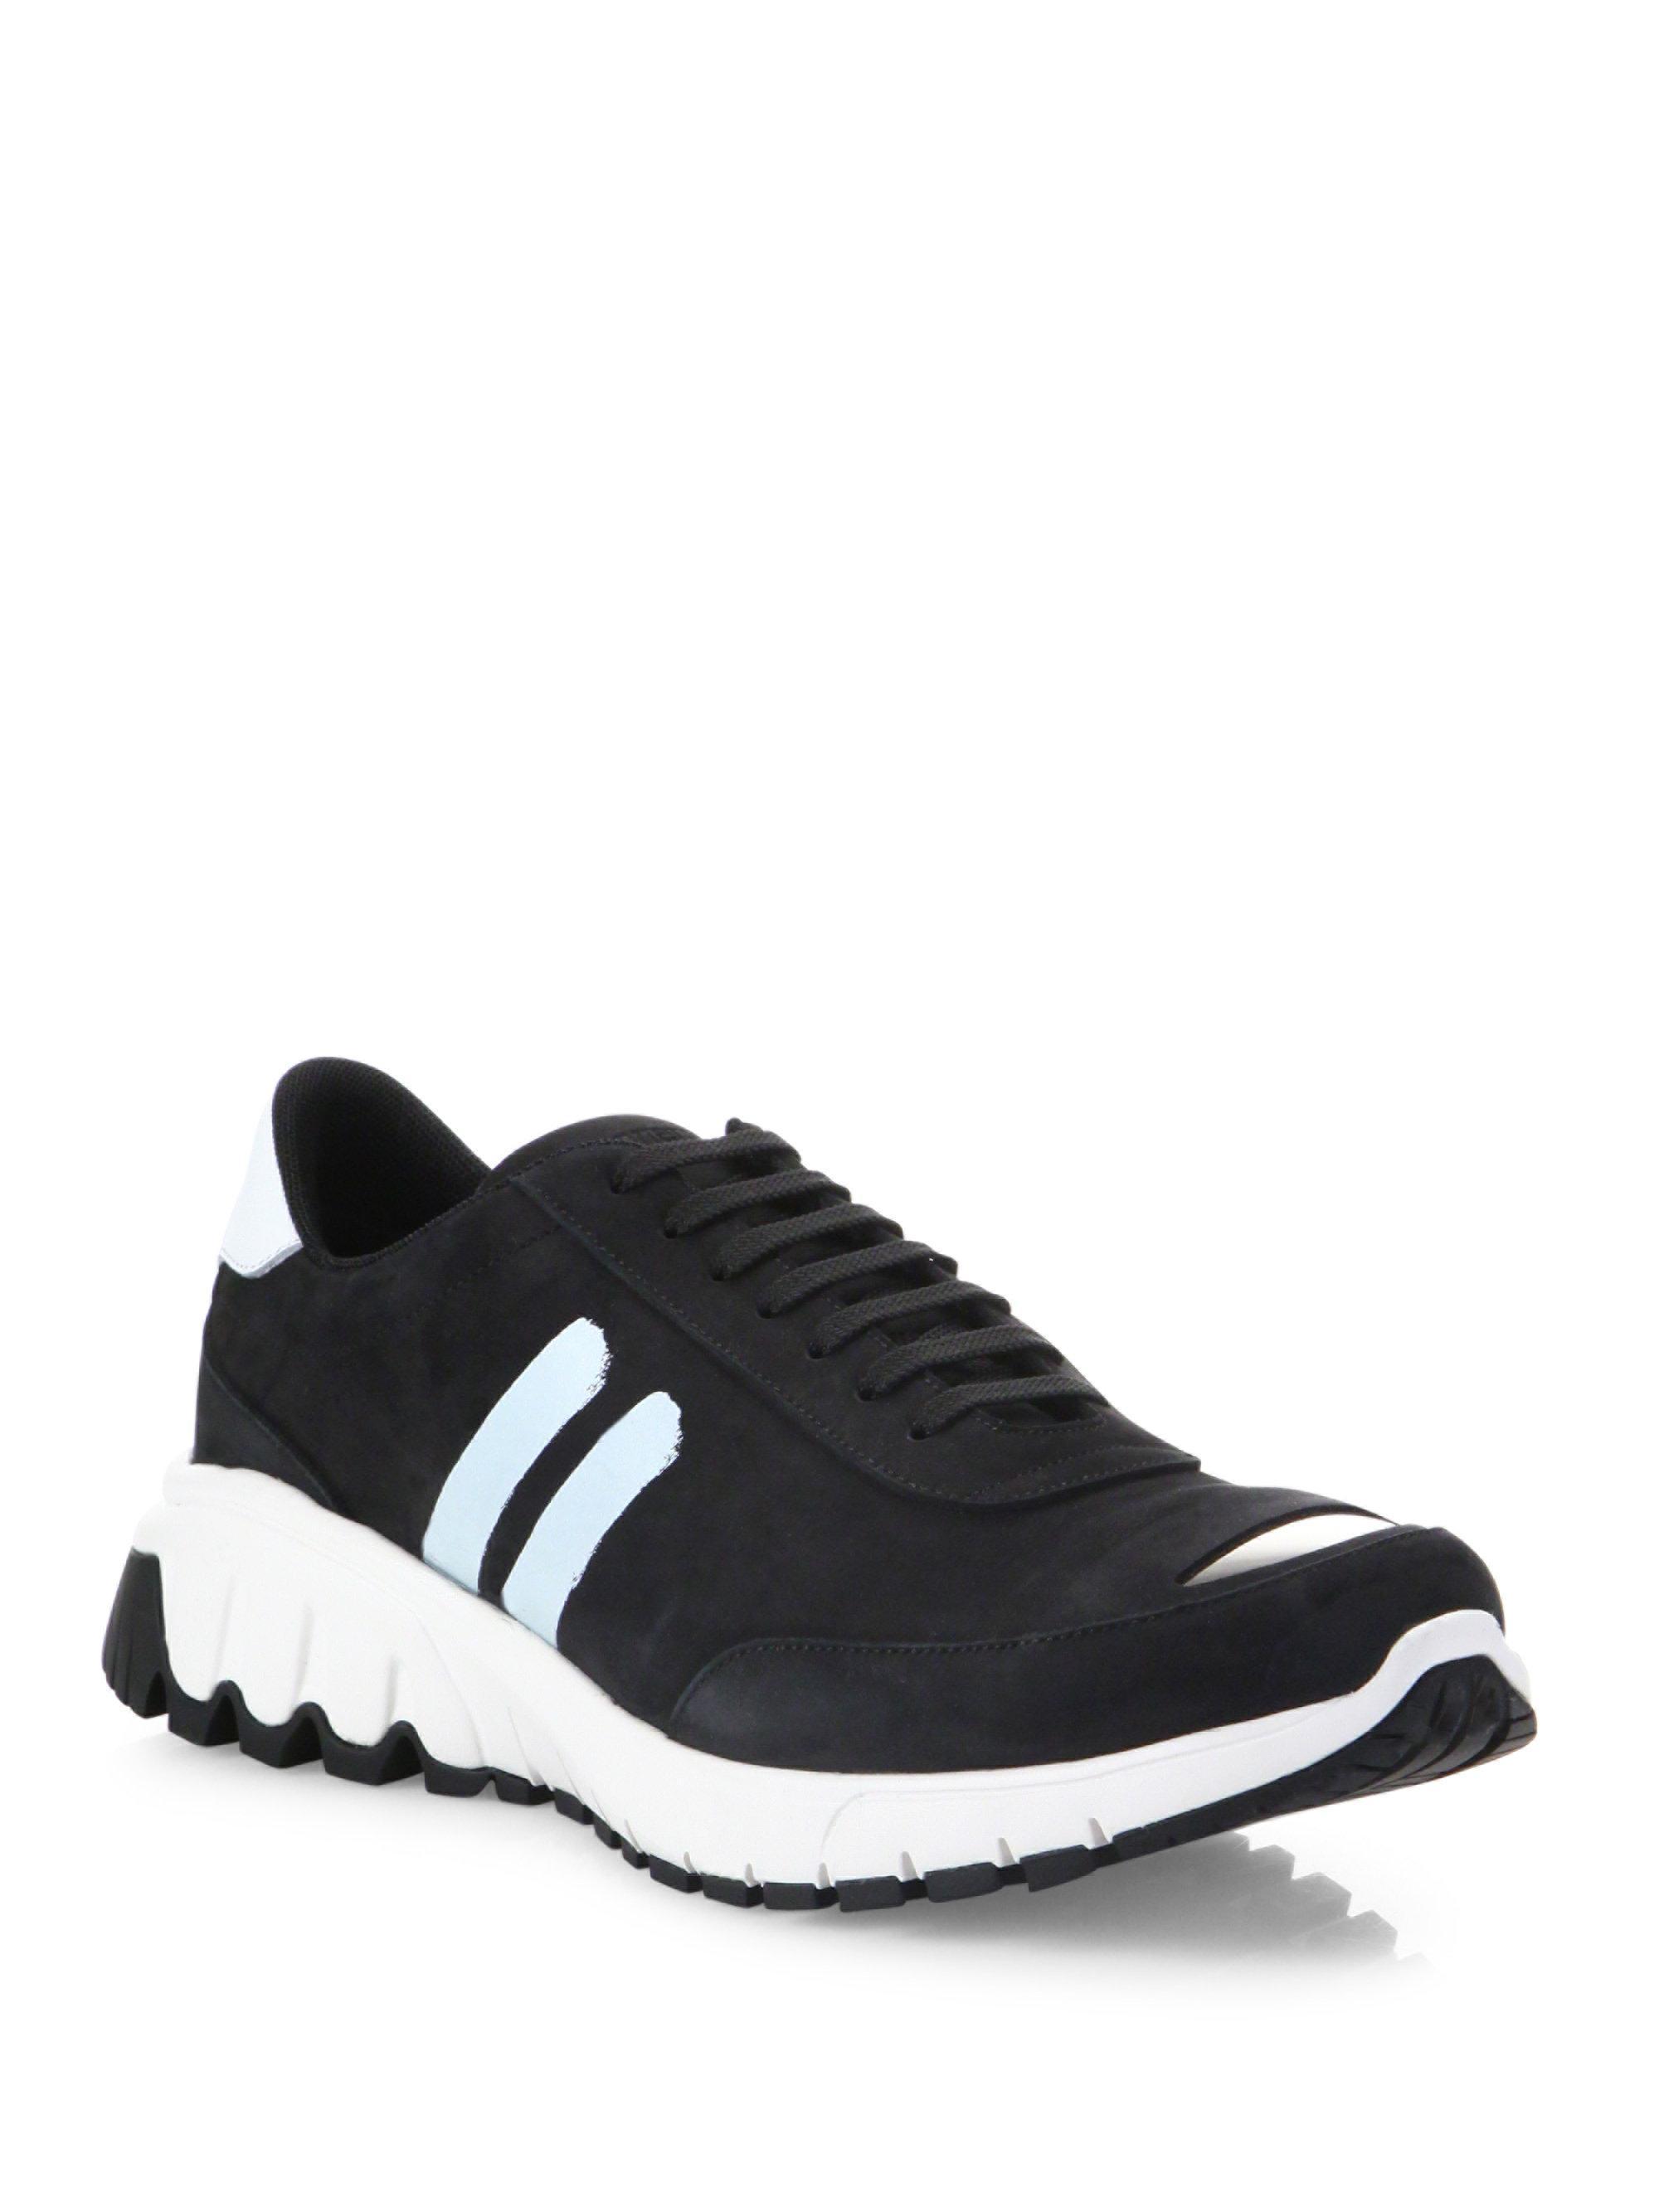 running sneakers - Black Neil Barrett fBzv0AZ7